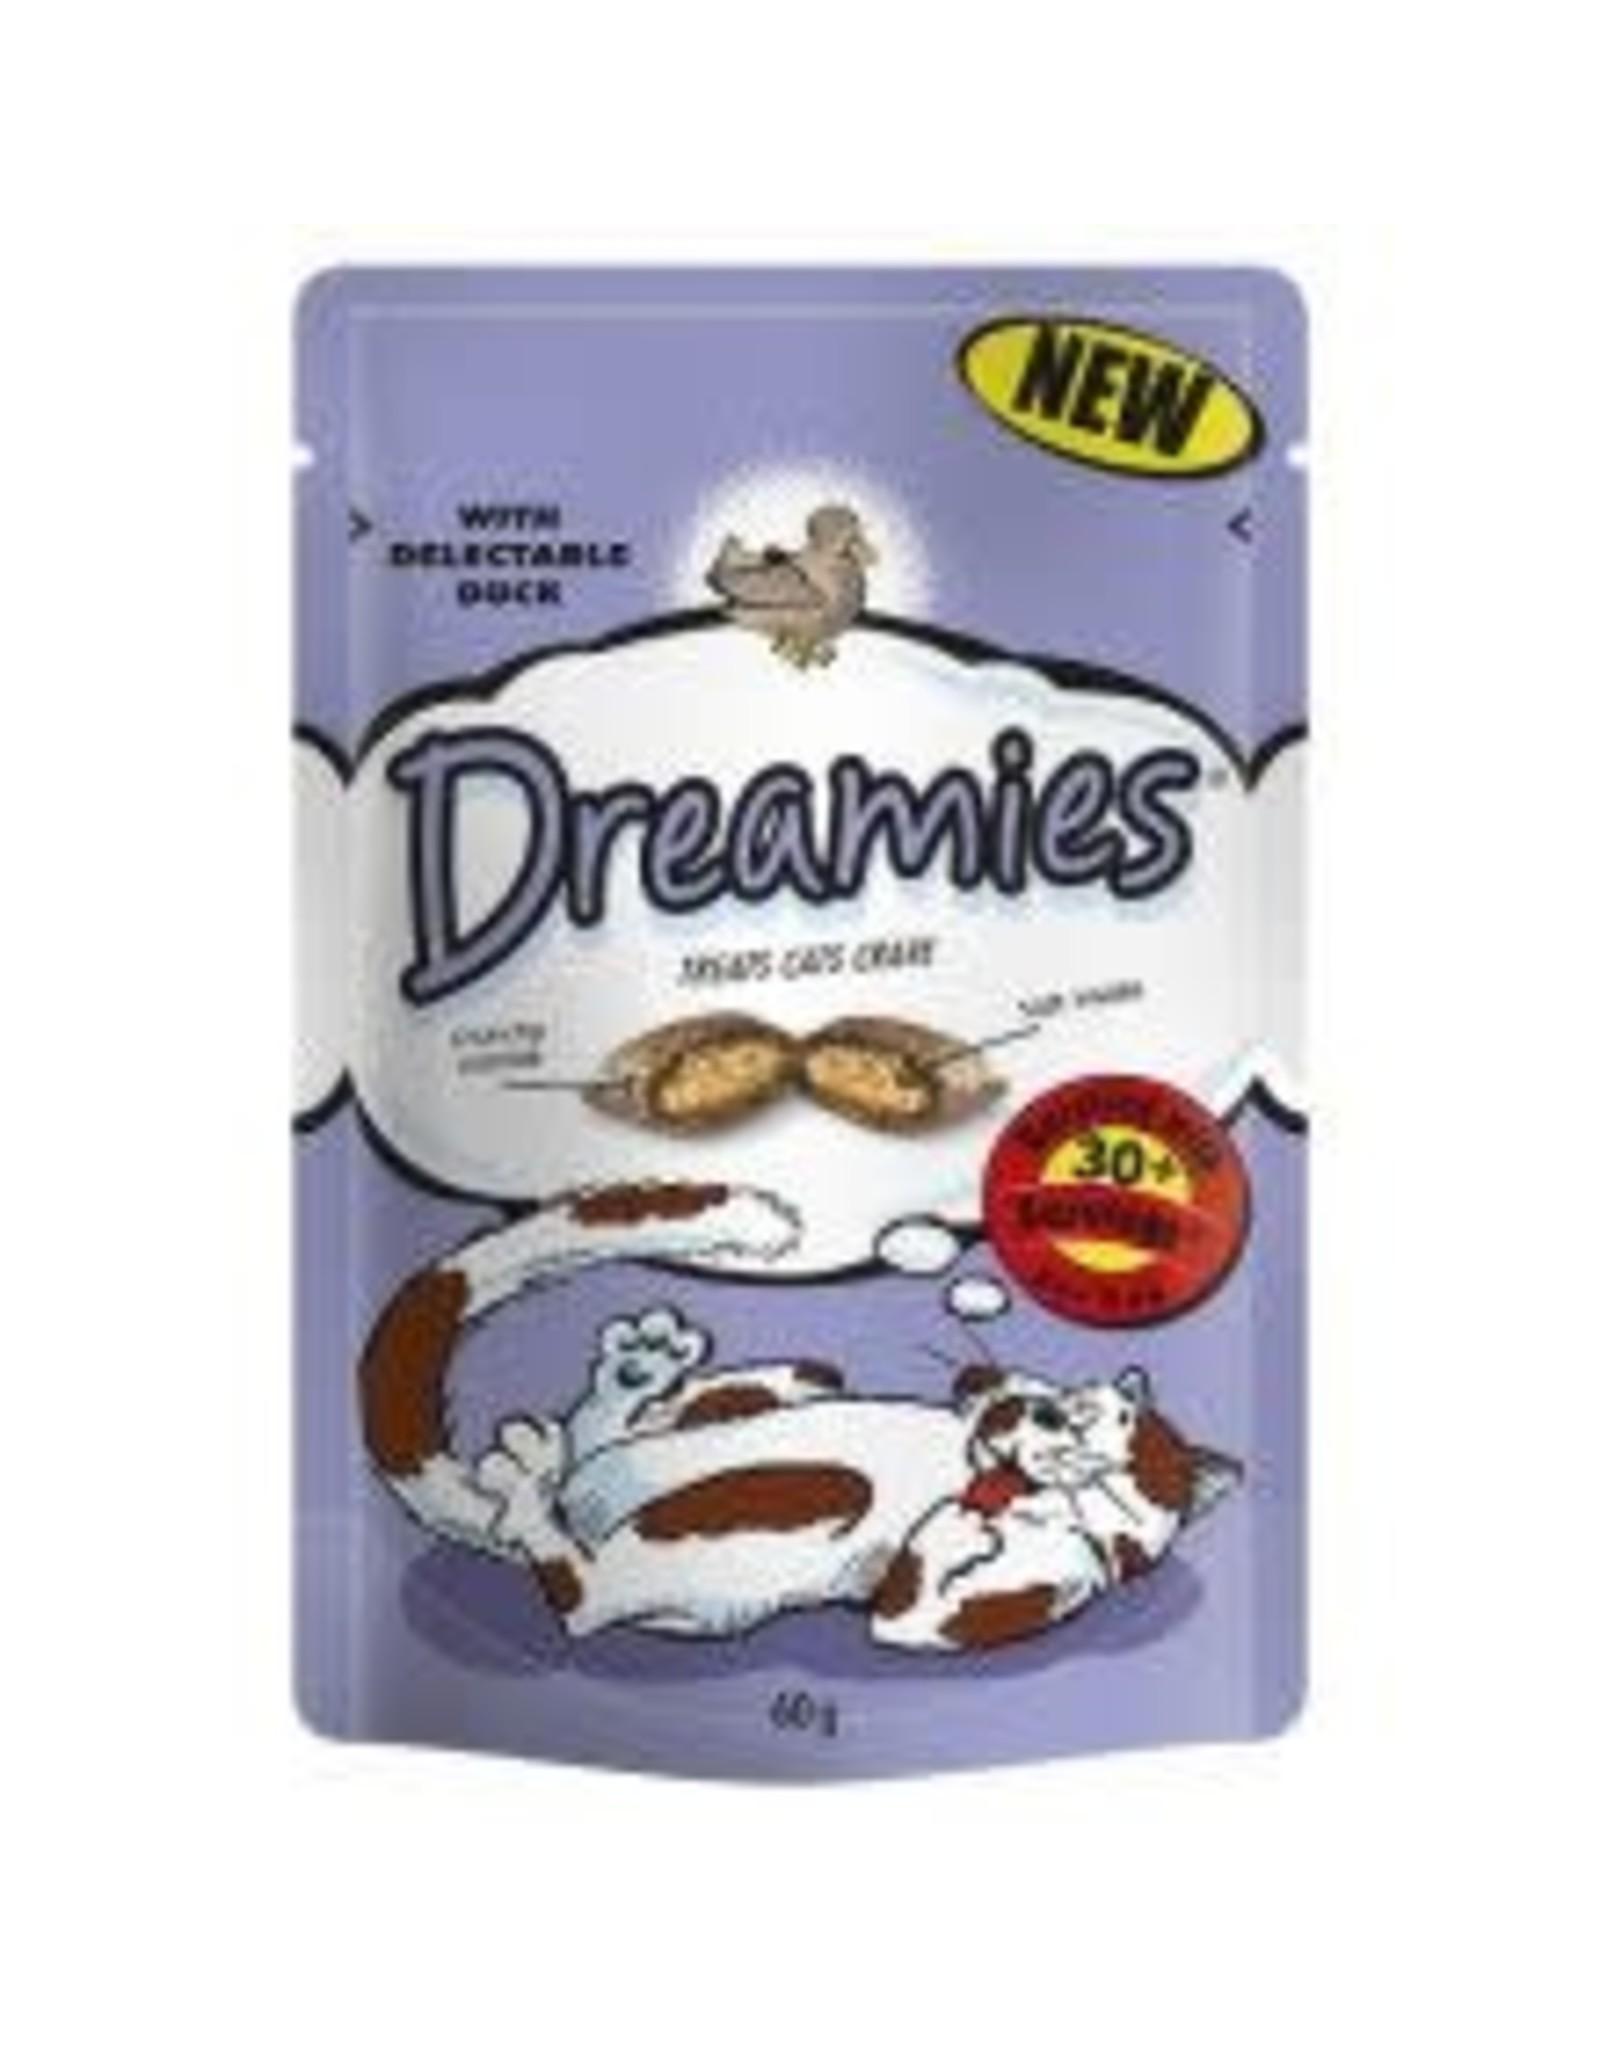 Dreamies Dreamies 60g